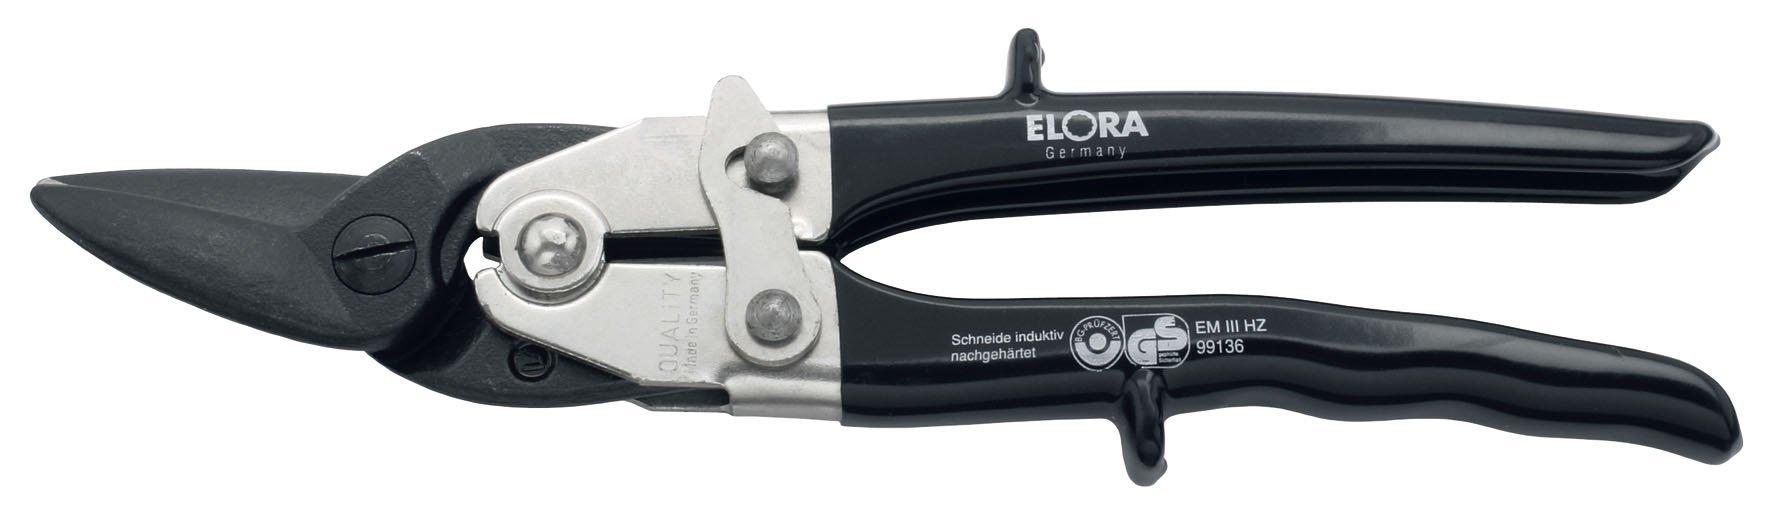 Elora 483000026000 Shape Cutting Lever Tin Snip right 483R